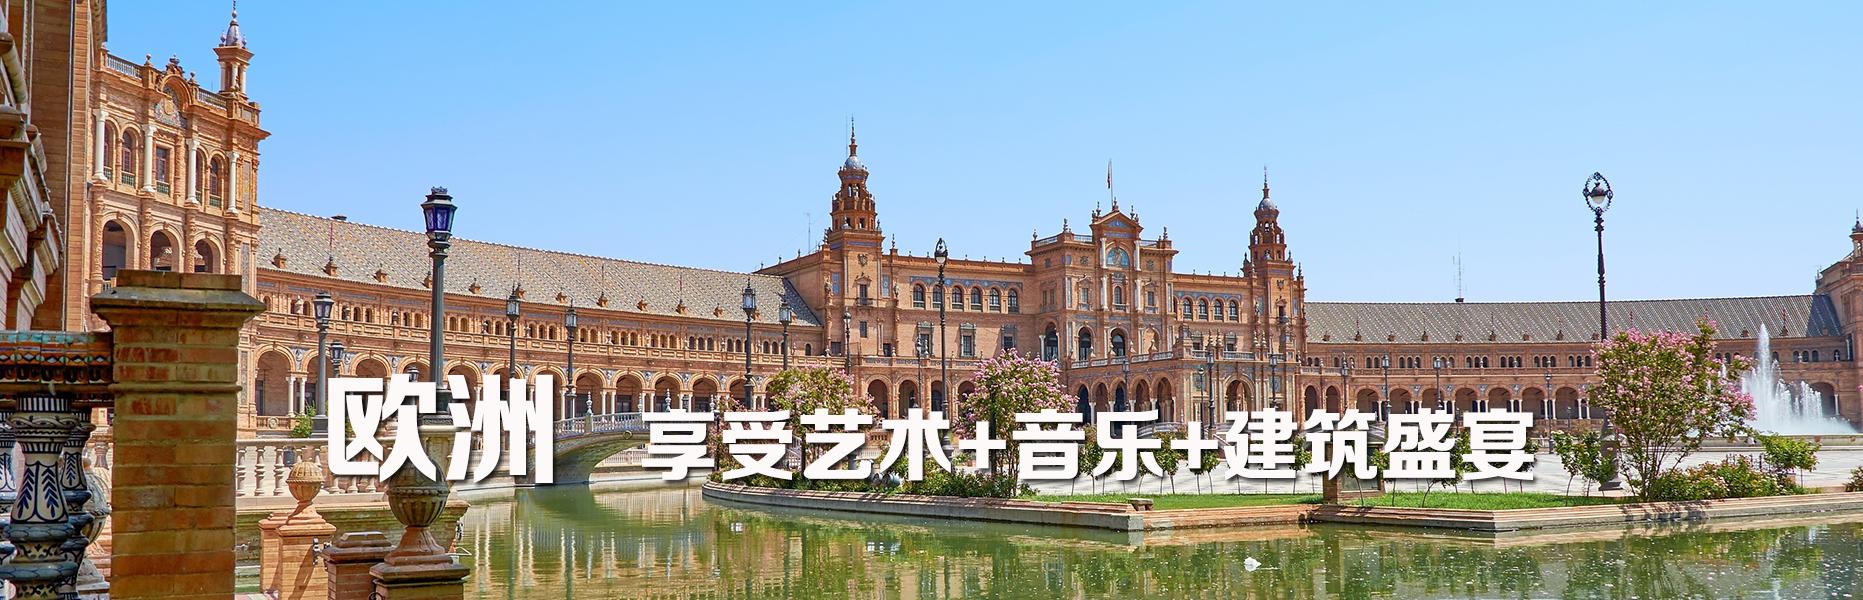 雷火电竞官方app下载国家banner-欧洲雷火电竞官方app下载